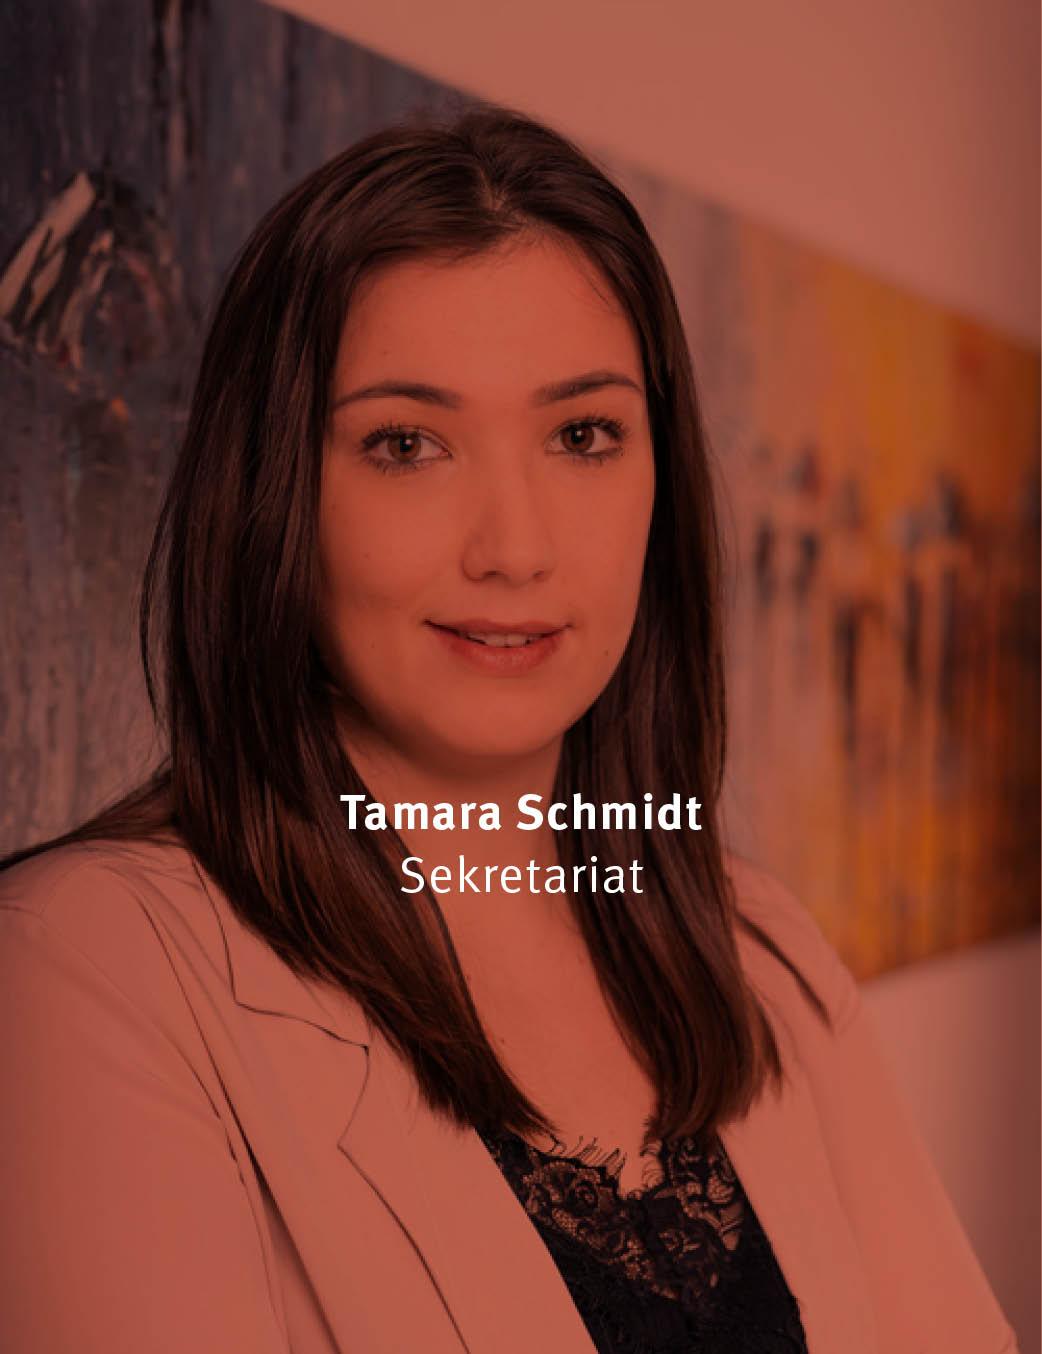 Tamara Schmidt Sekretariat Steuerberater Langenau Klaiber, Lotspeich, Kneer, Anhorn, Stiele, Partnerschaft mbB, Steuer, Langenau